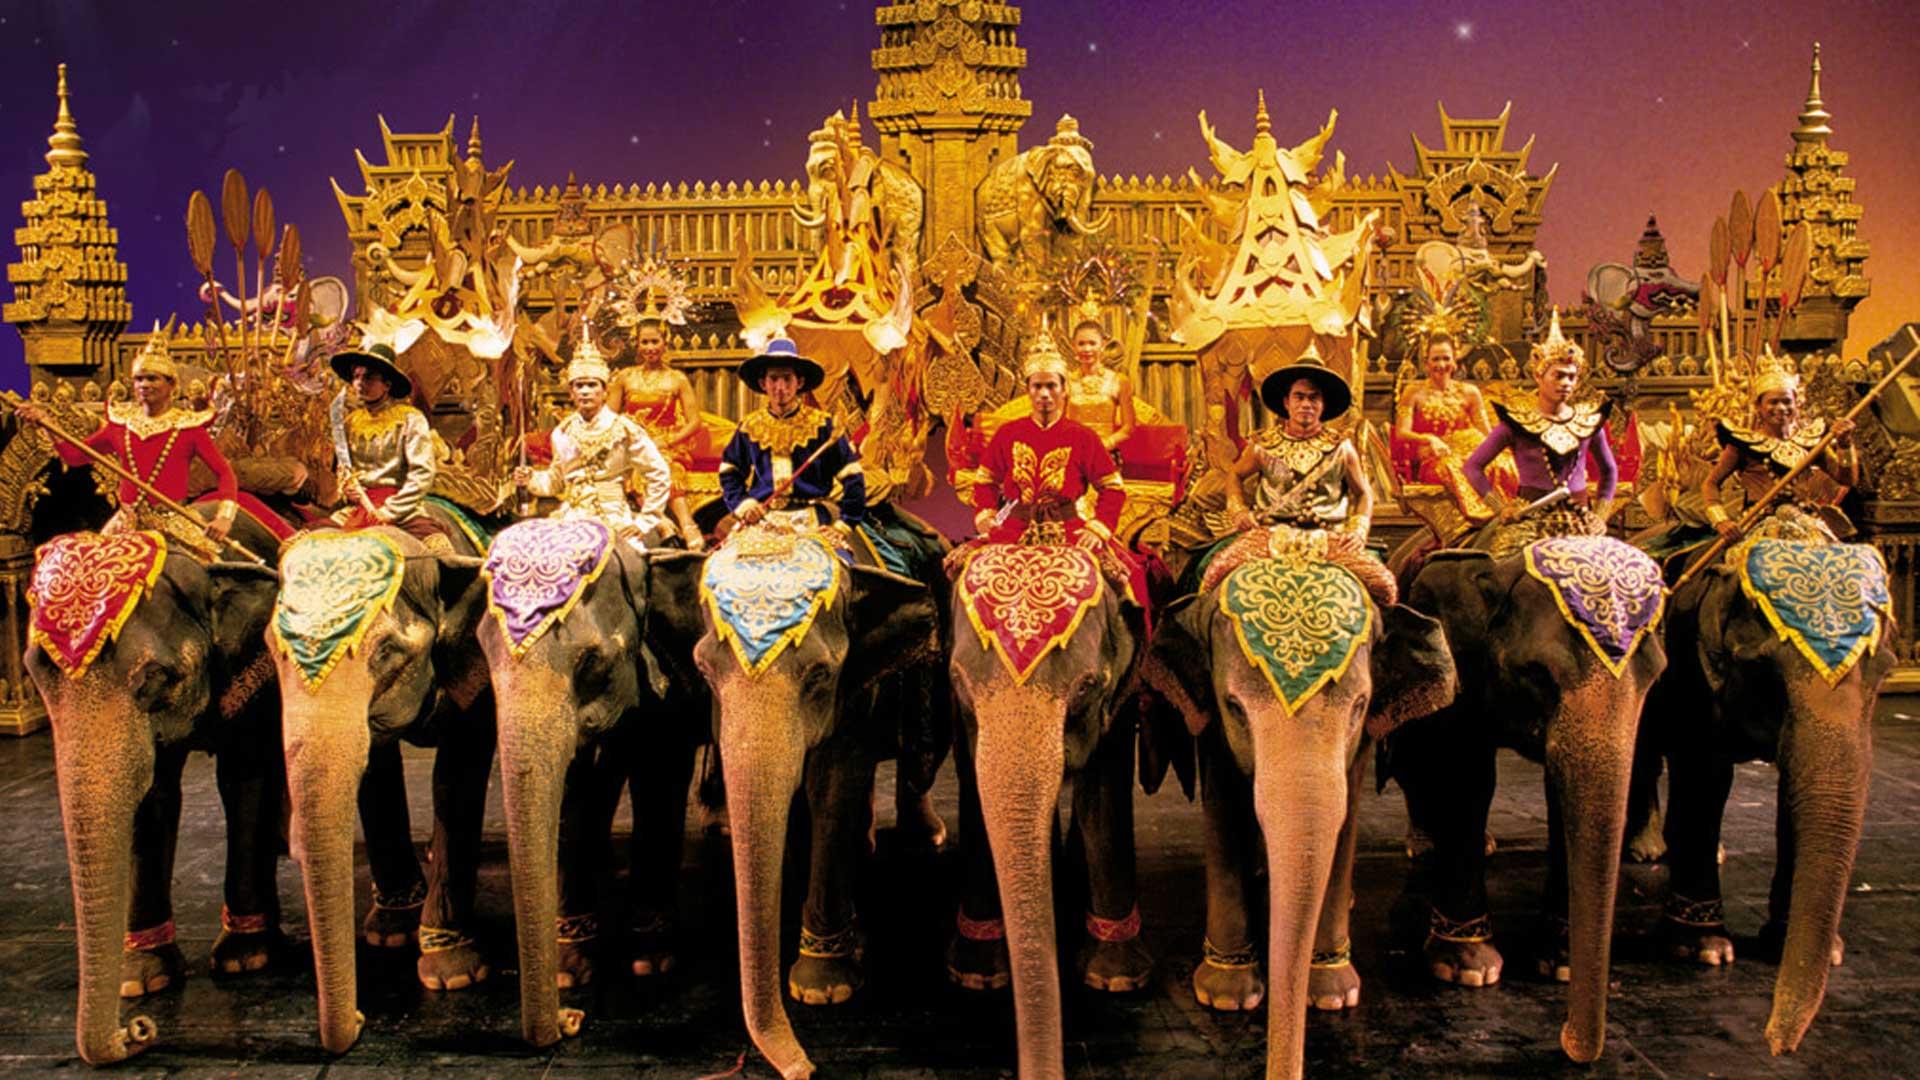 Phuket Fantasea, Ayurveda, Wellness, Yoga Retreats, Phuket Thailand, Mangosteen Ayurveda & Wellness Resort, Number 1 Ayurveda Resort in Thailand, Rawai, Phuket.